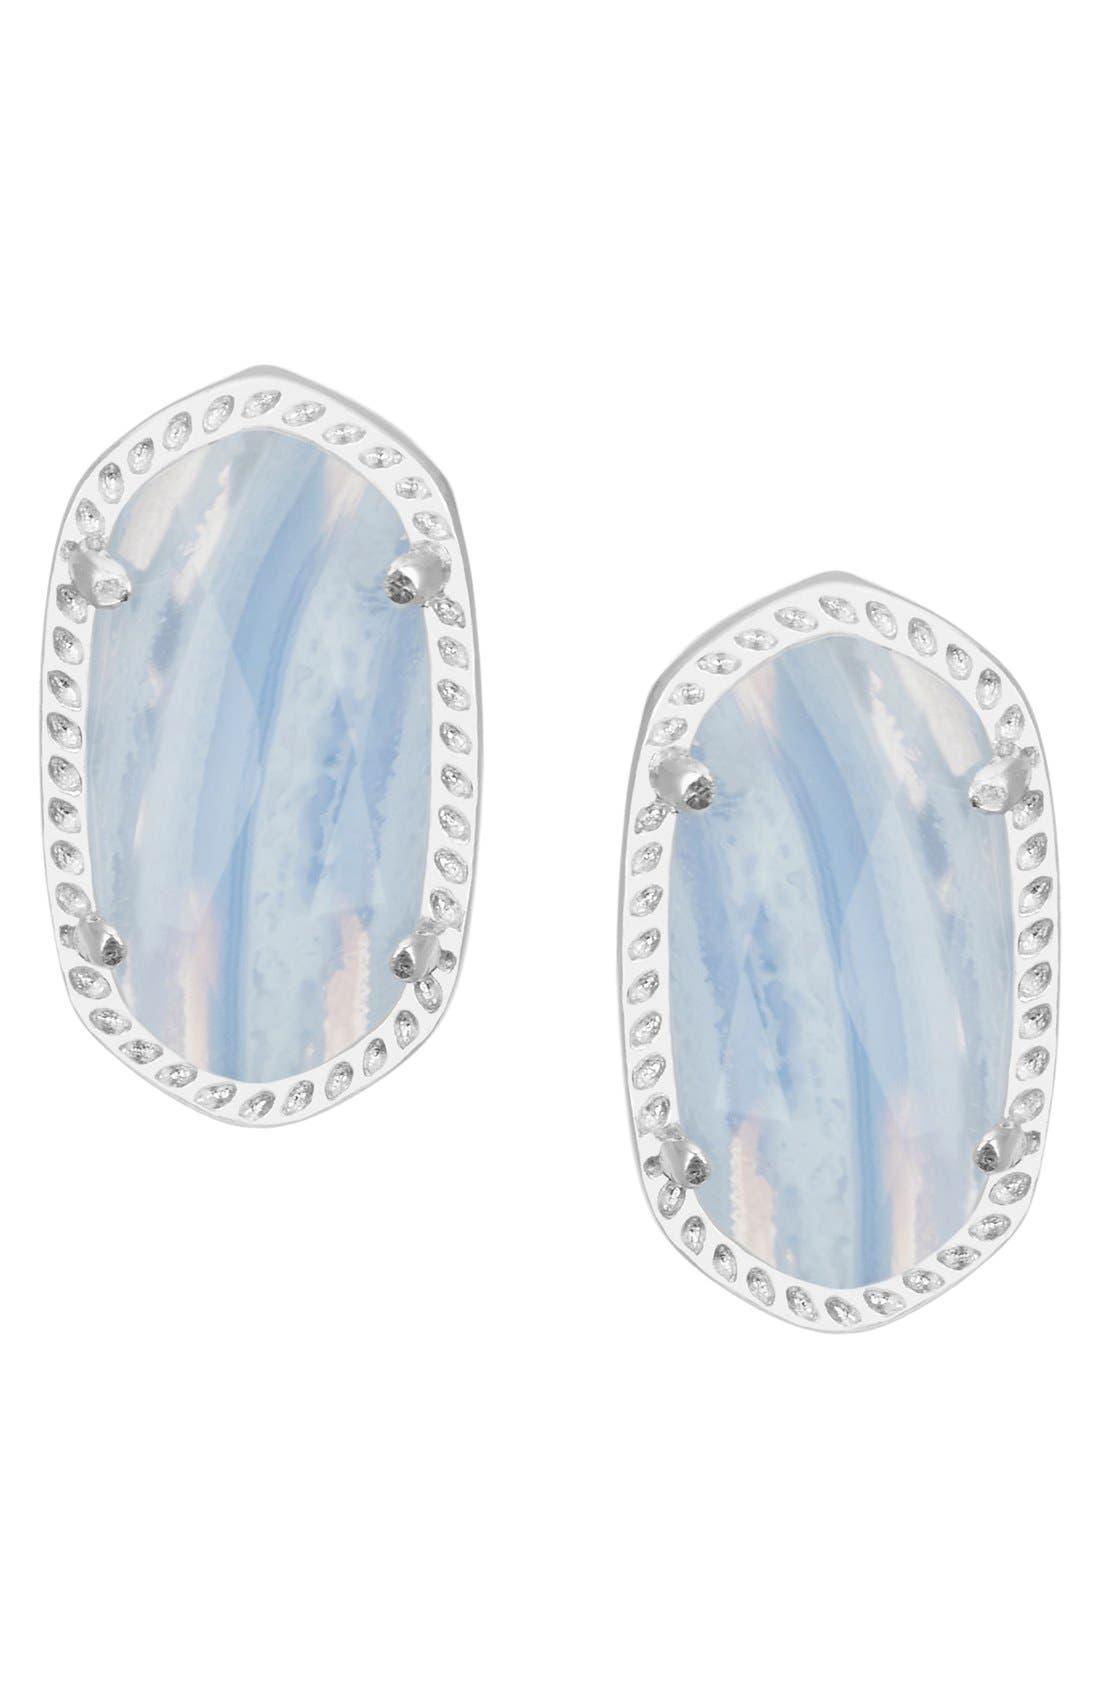 Main Image - Kendra Scott Ellie Oval Stud Earrings